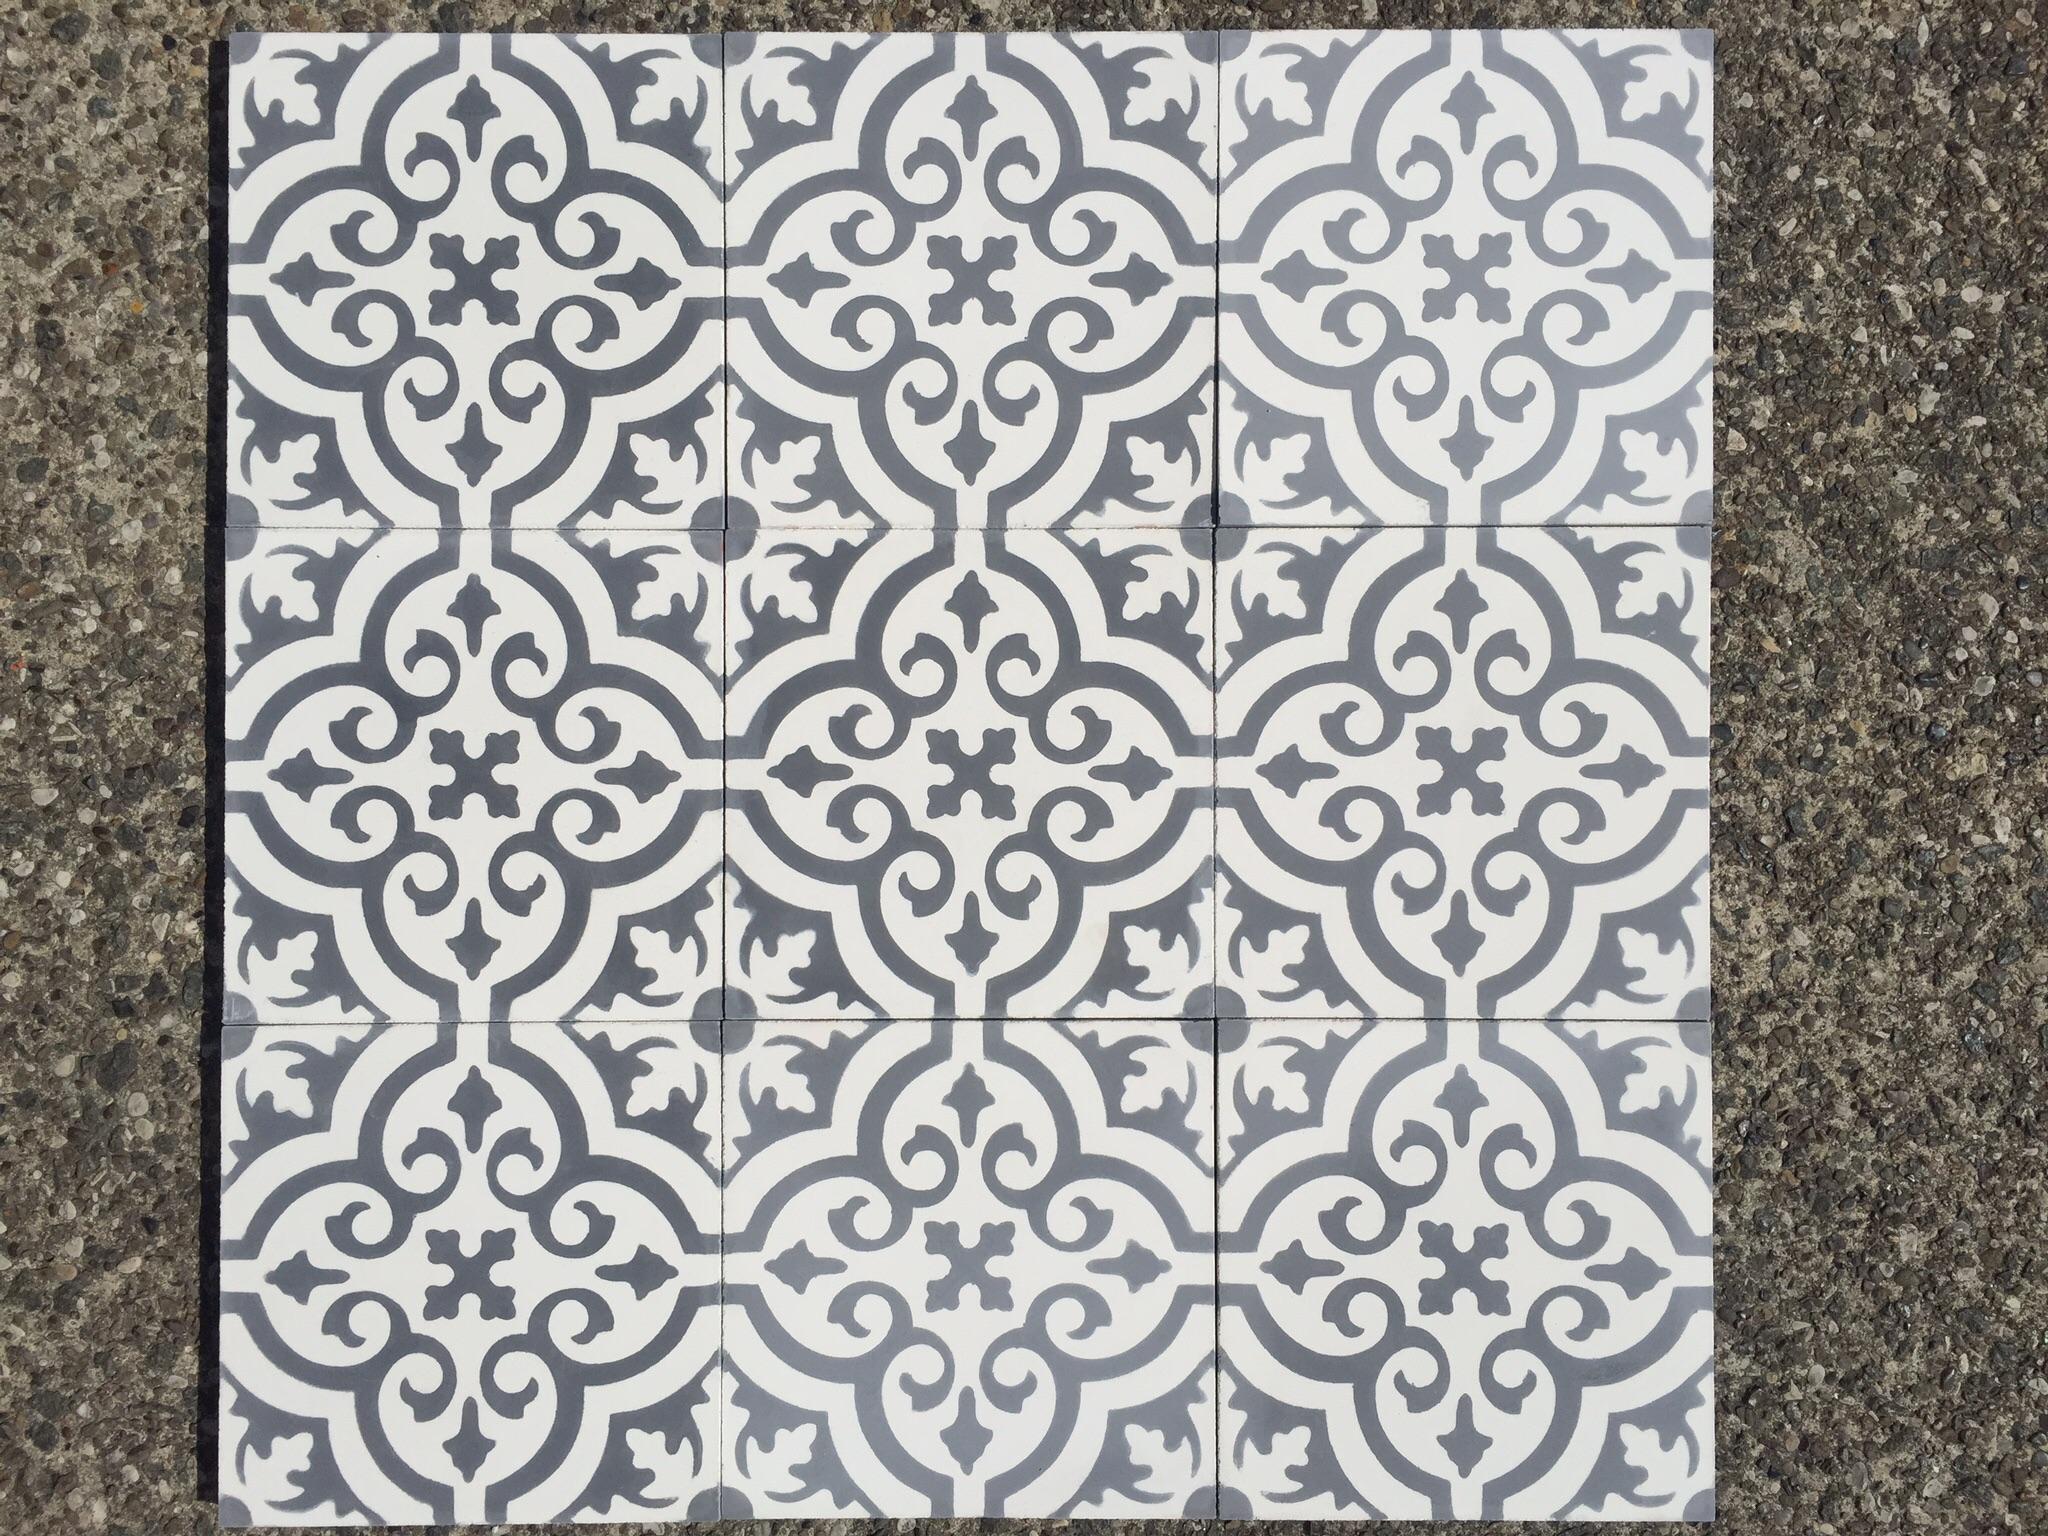 Zementfliesen Kaufen Keramik Loft Gmbh Der Fliesenhandel